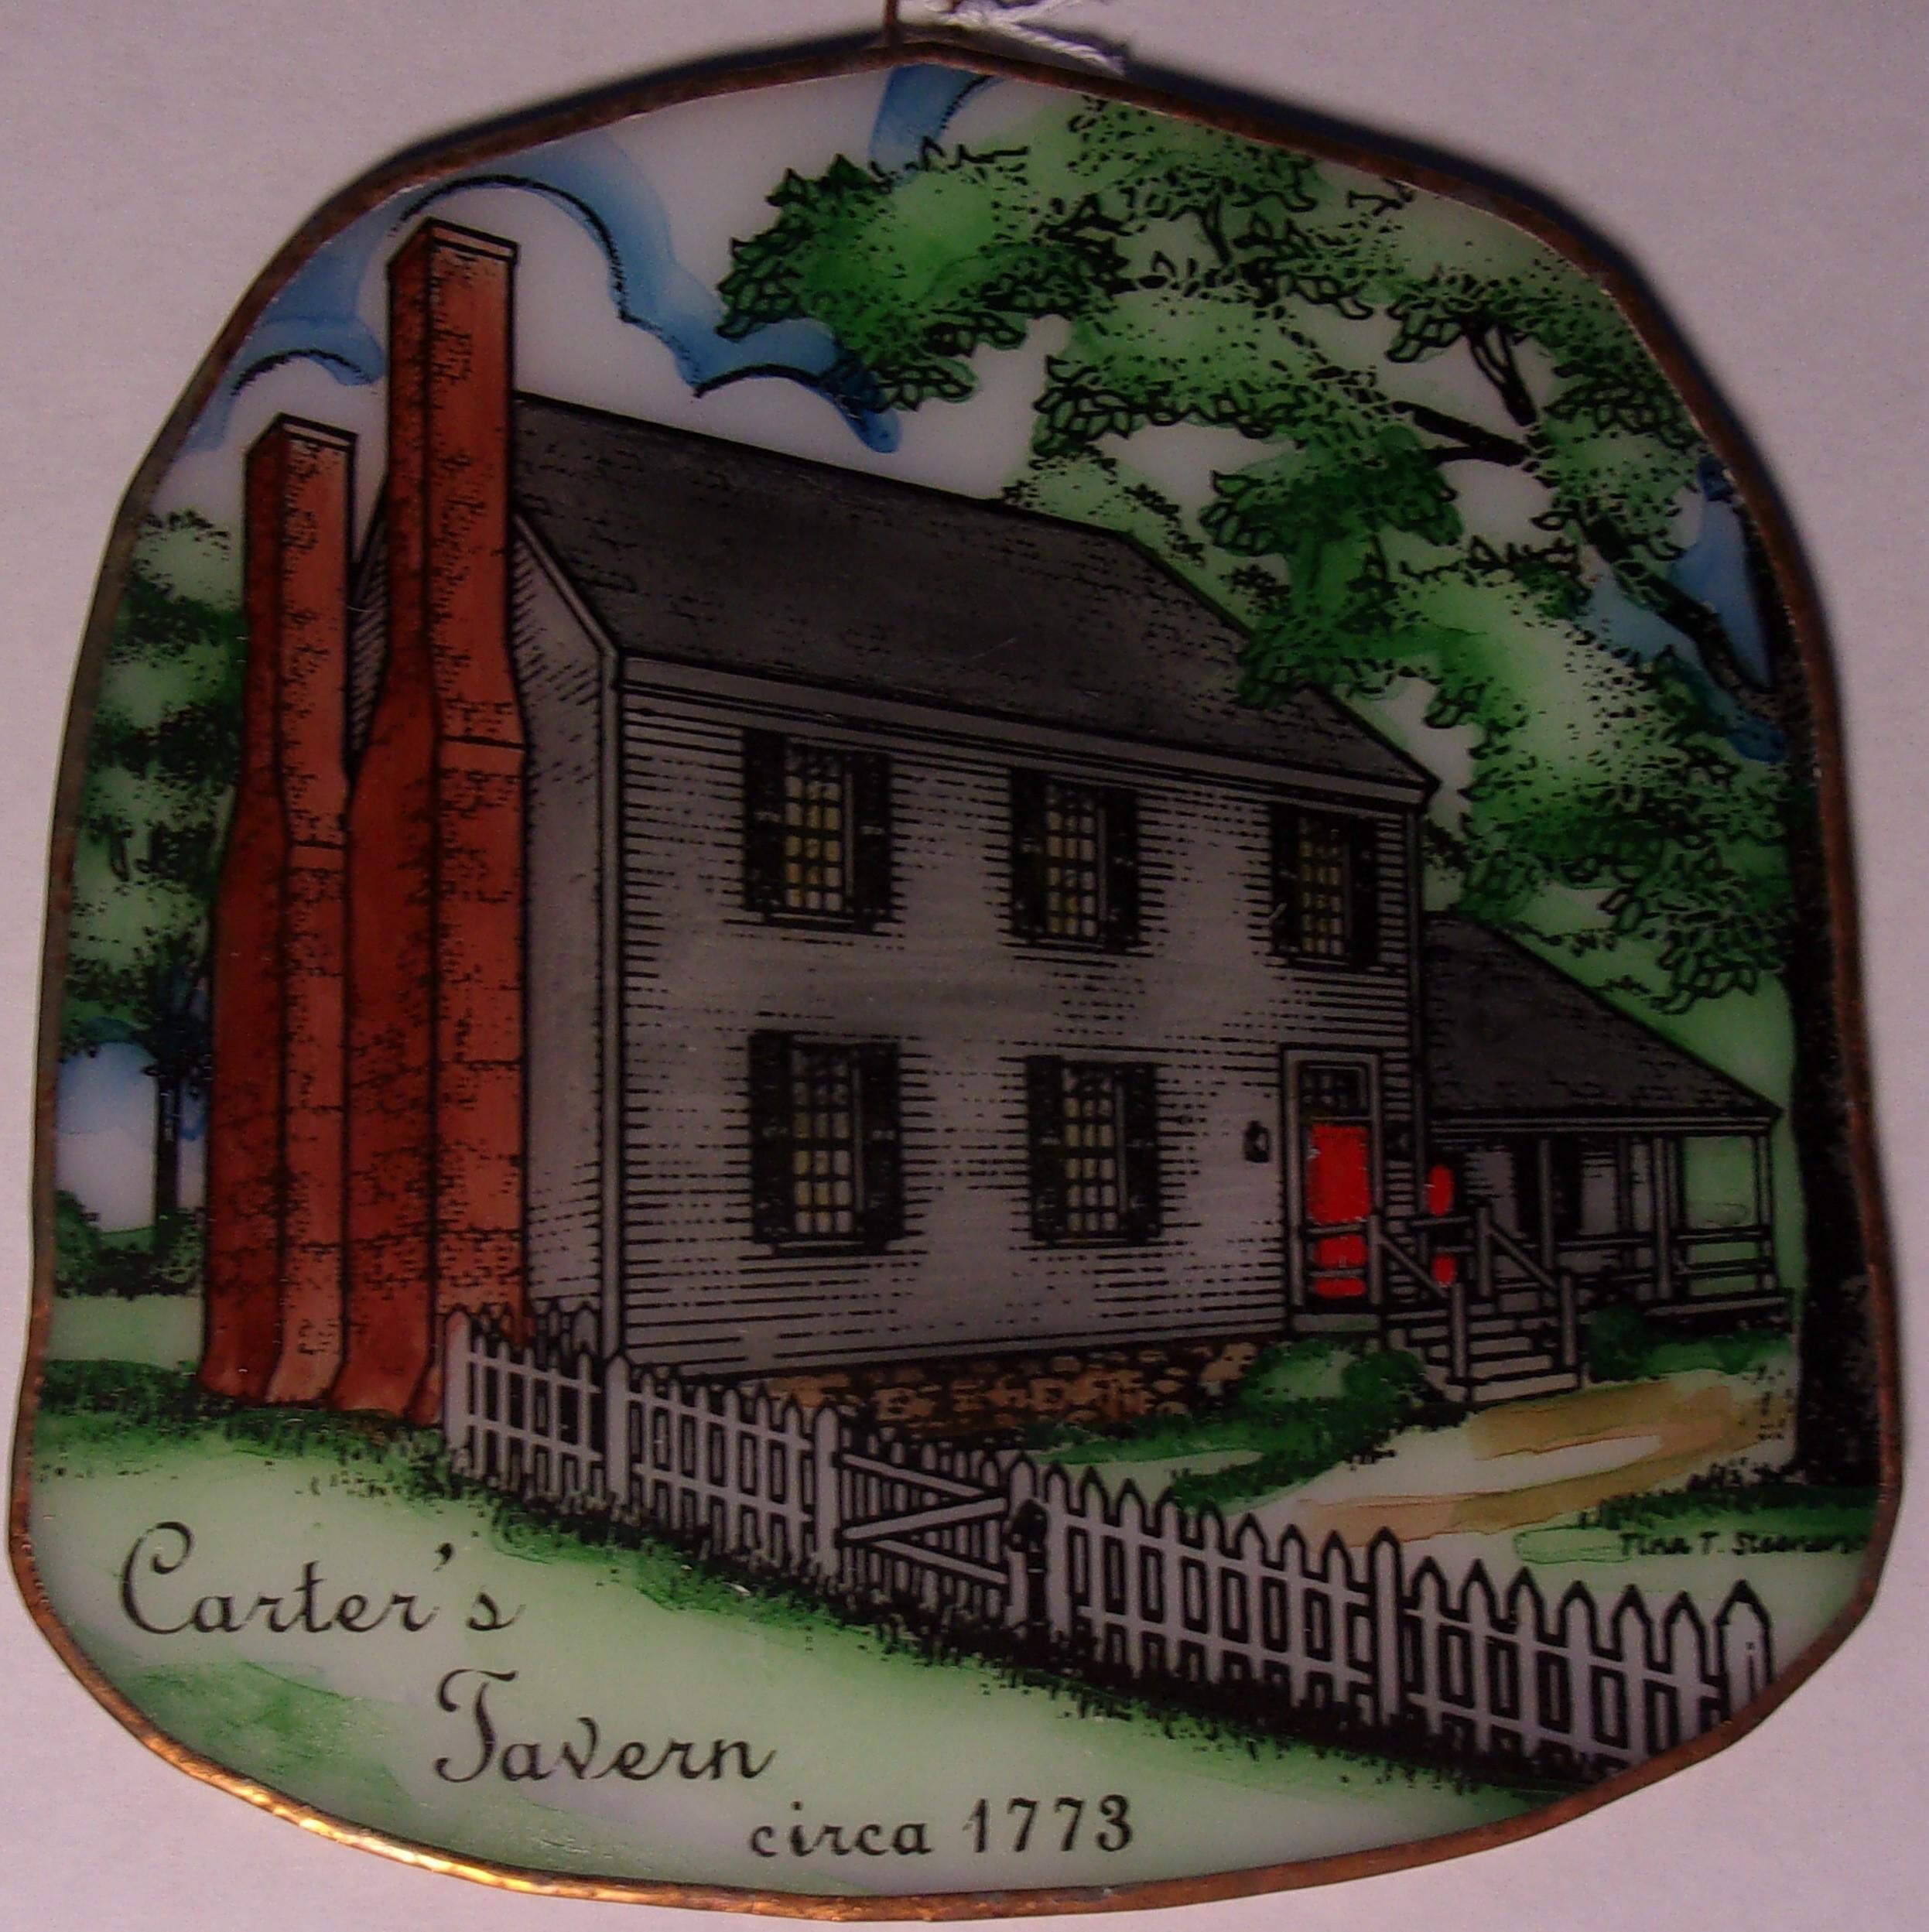 ORNAMENT Carter's Tavern.jpg